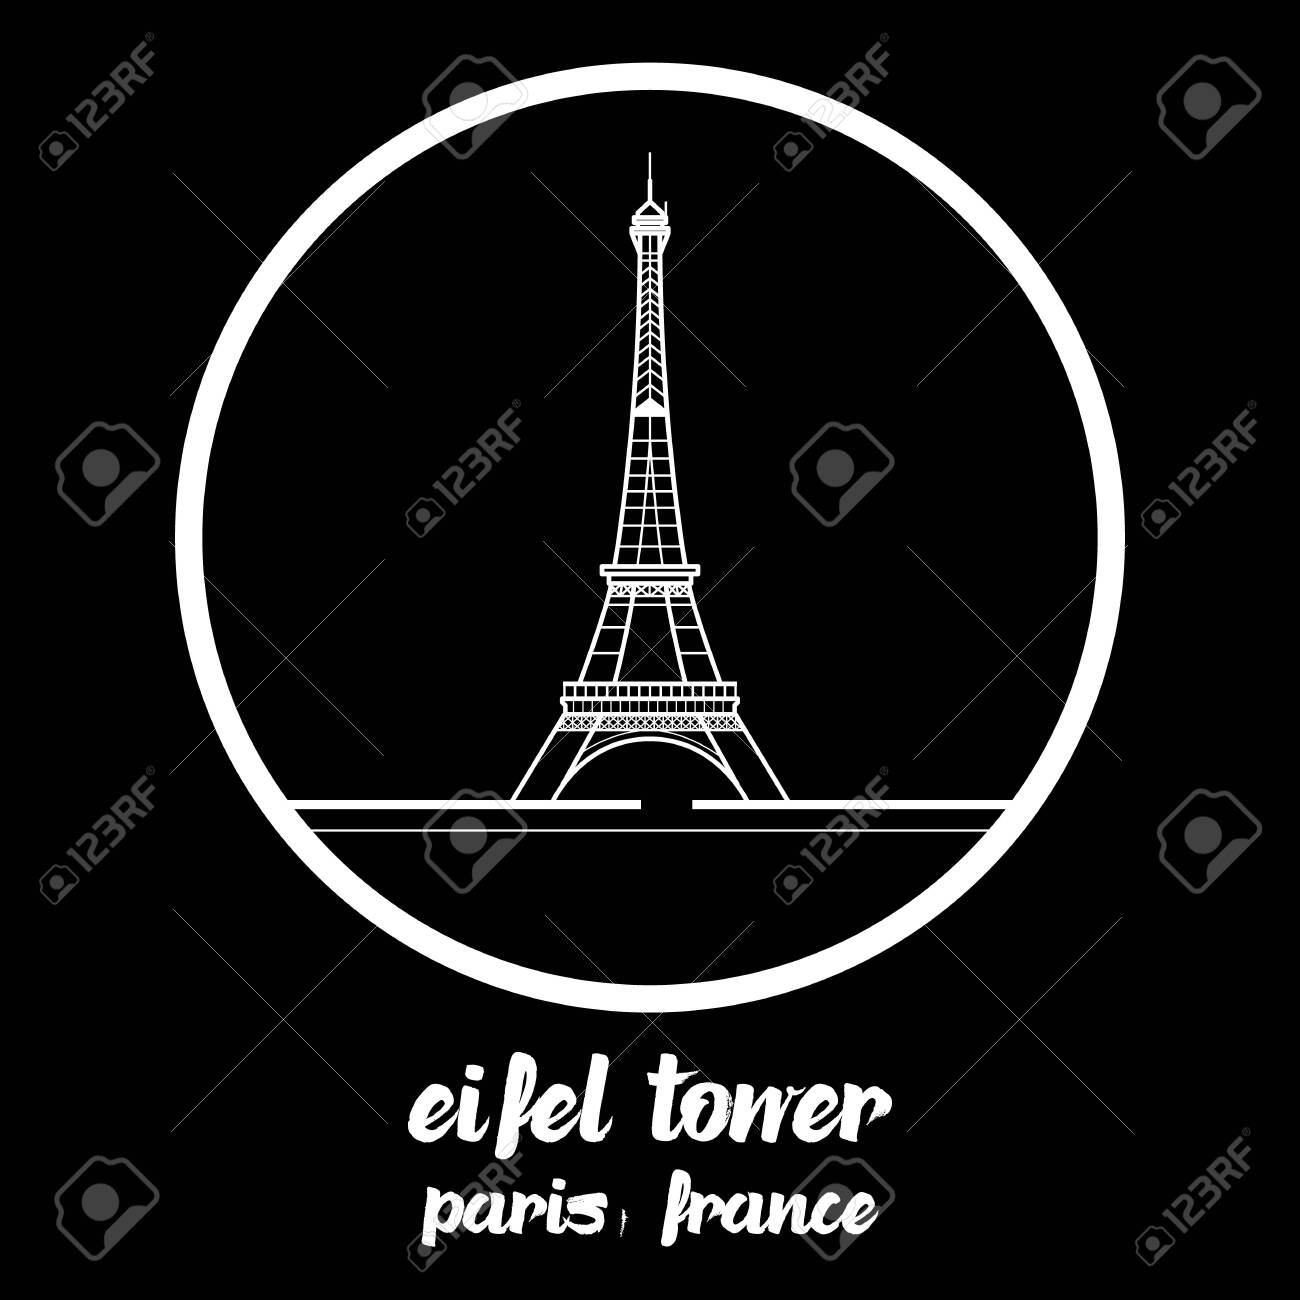 Circle Icon eiffel tower paris france. vector illustration. - 133311587